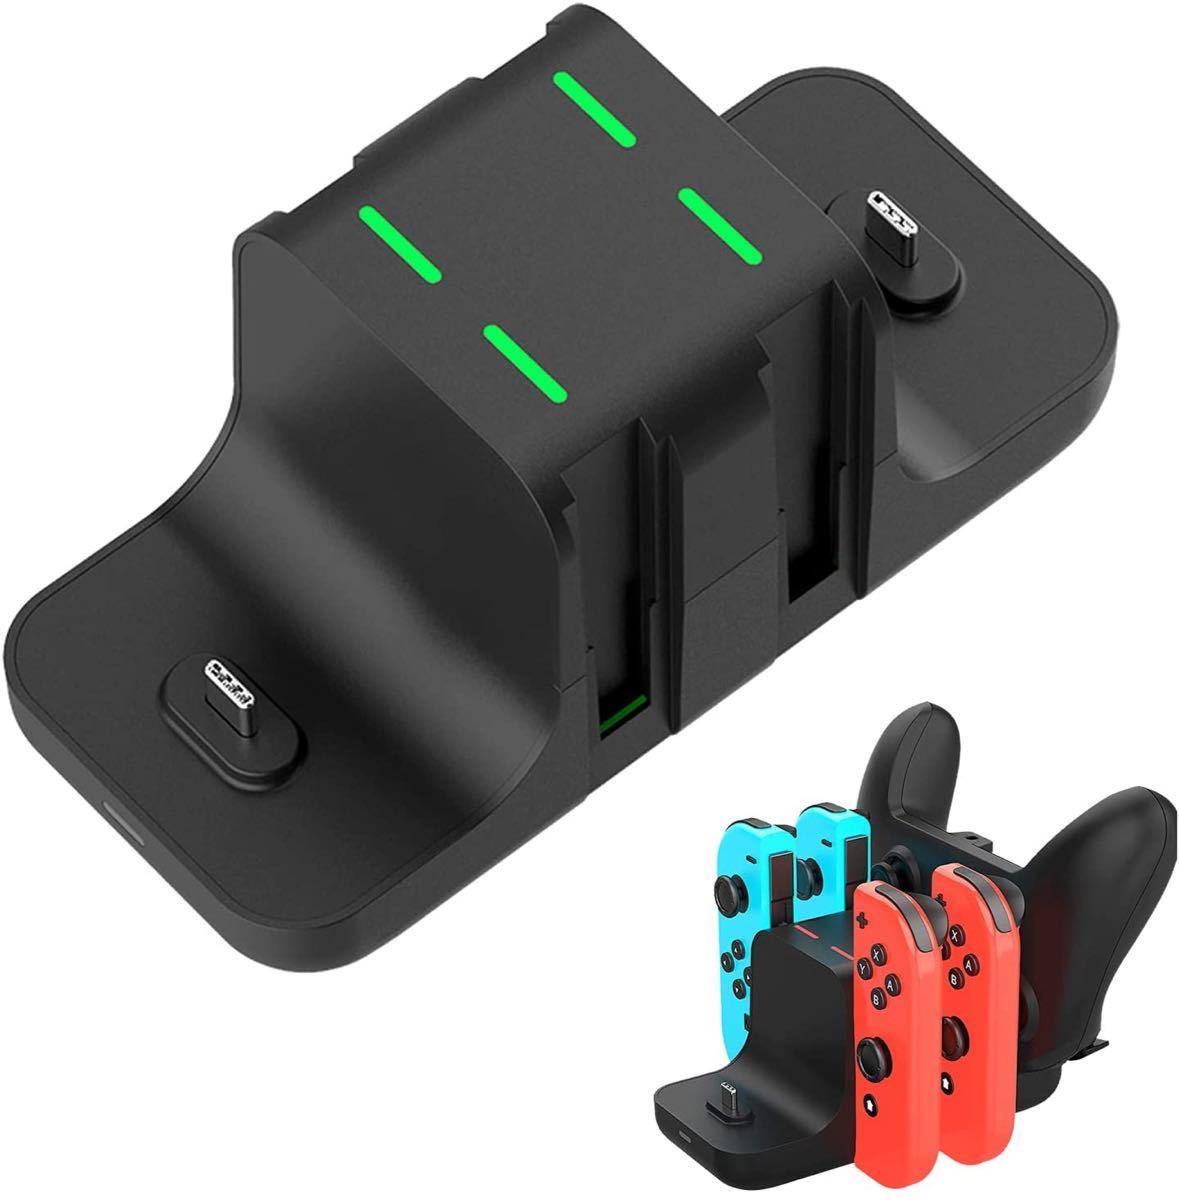 Switch Joy-Con 用 充電スタンド 急速充電 6台同時充電可能 収納 一体型 ニンテンドー スイッチ ジョイコン